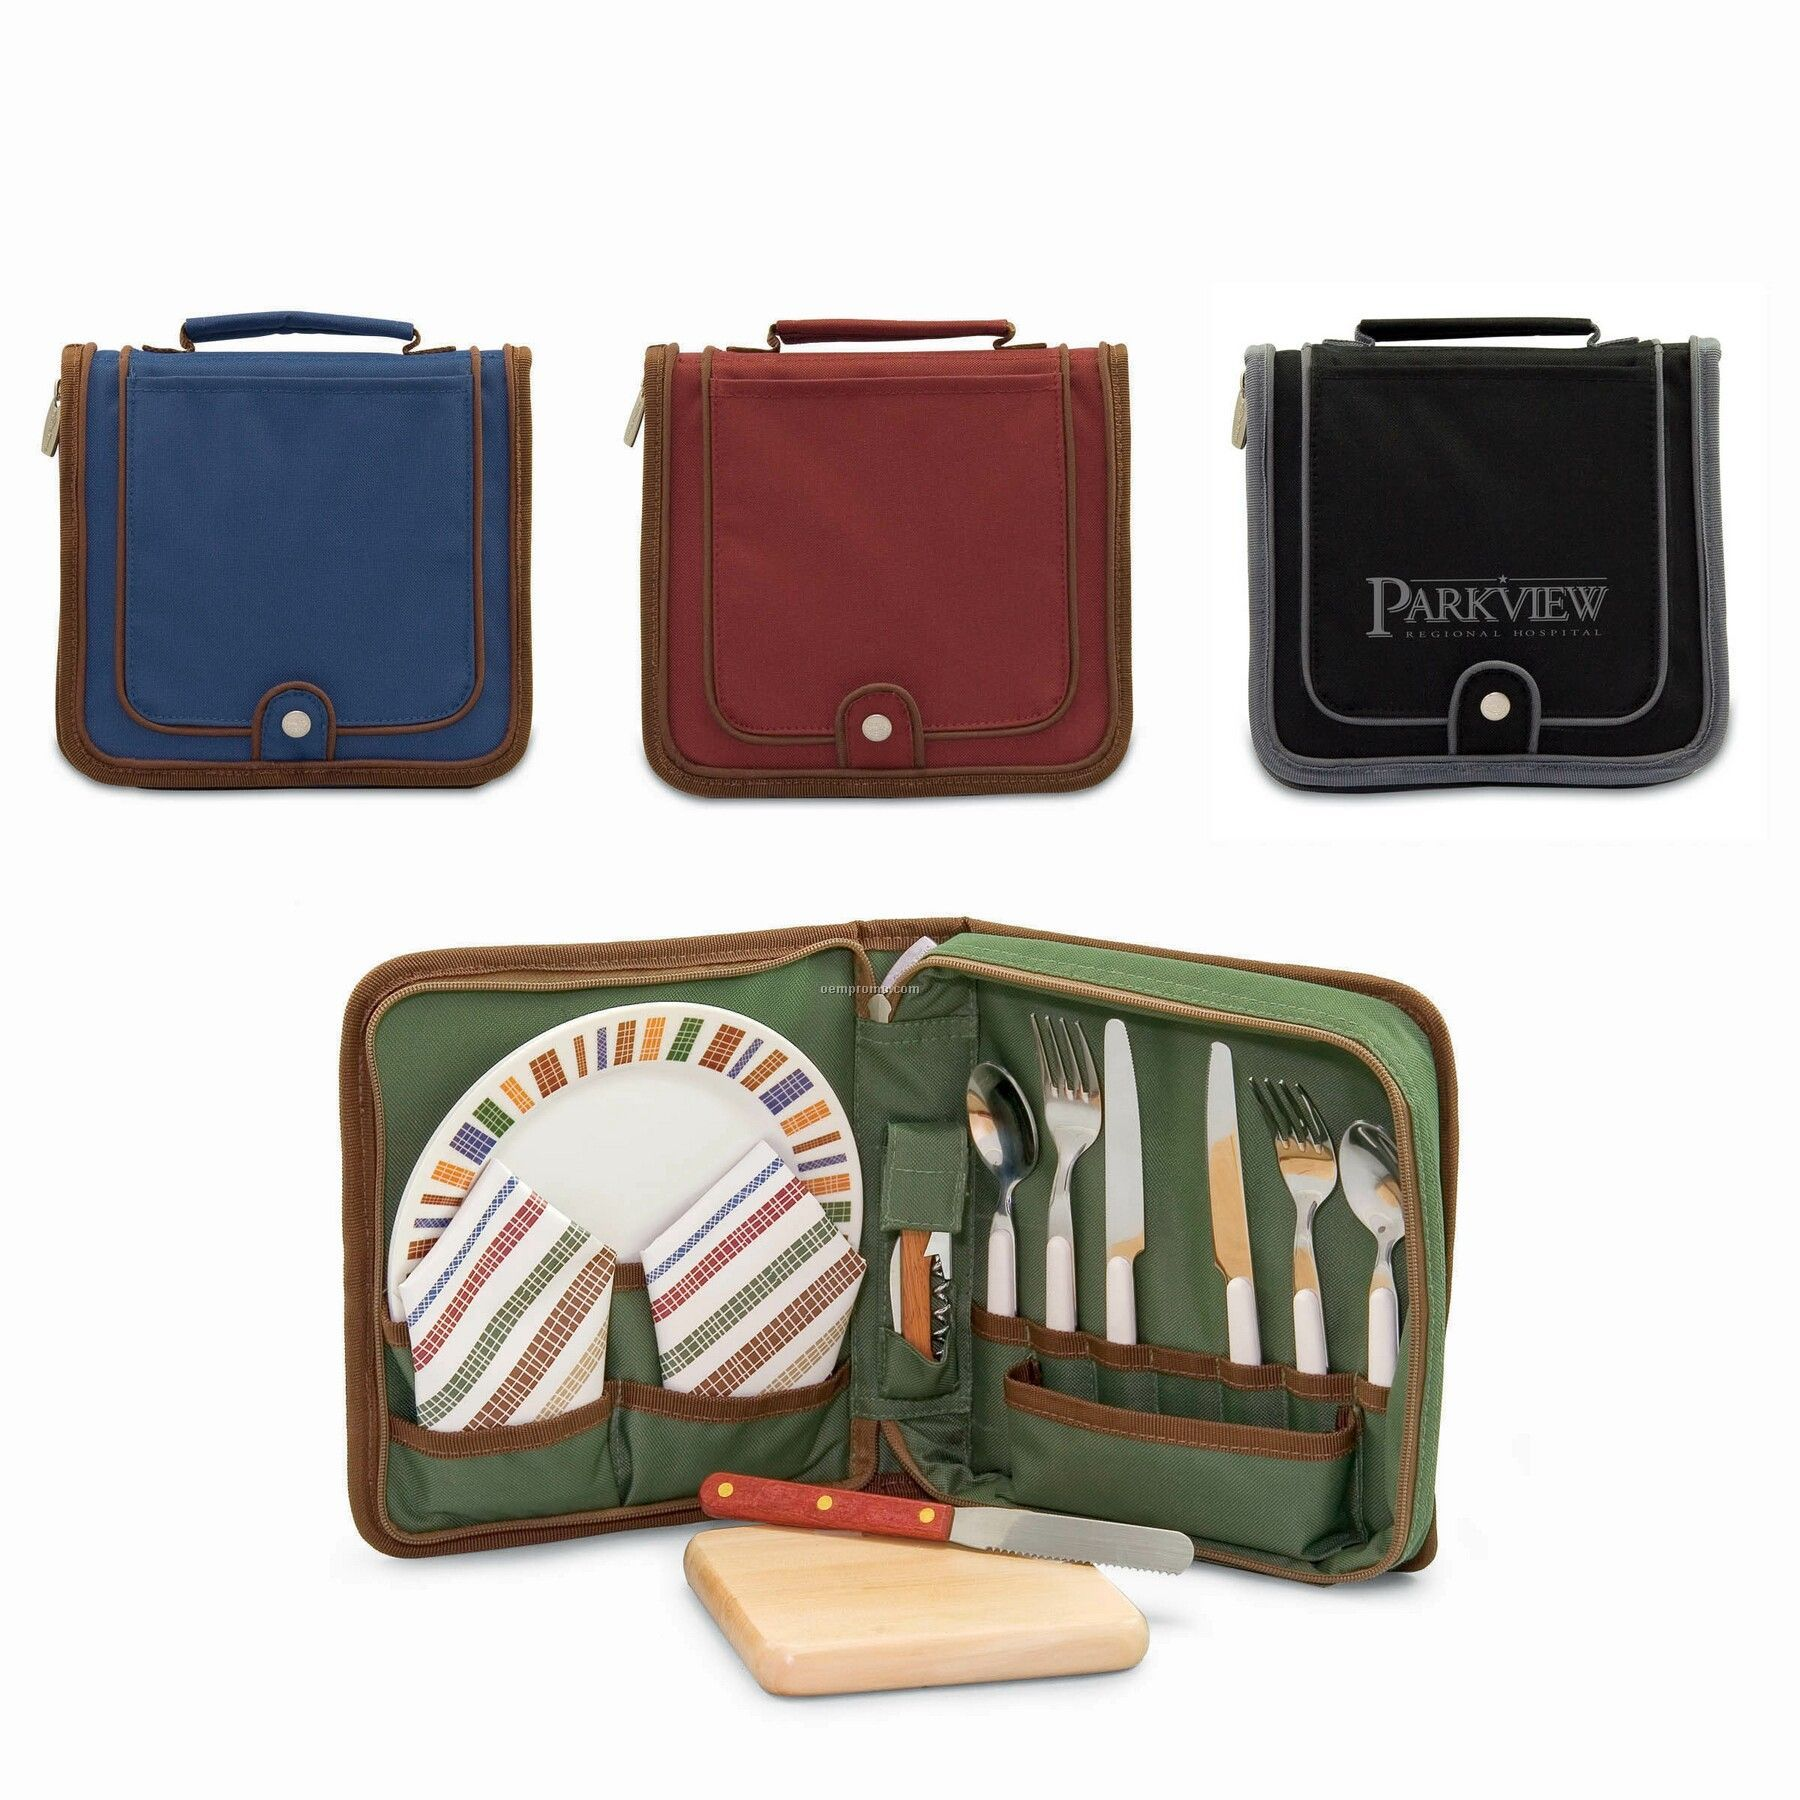 Piatto Wine & Cheese Square Travel Pack W/ Service For 2 (Solids)